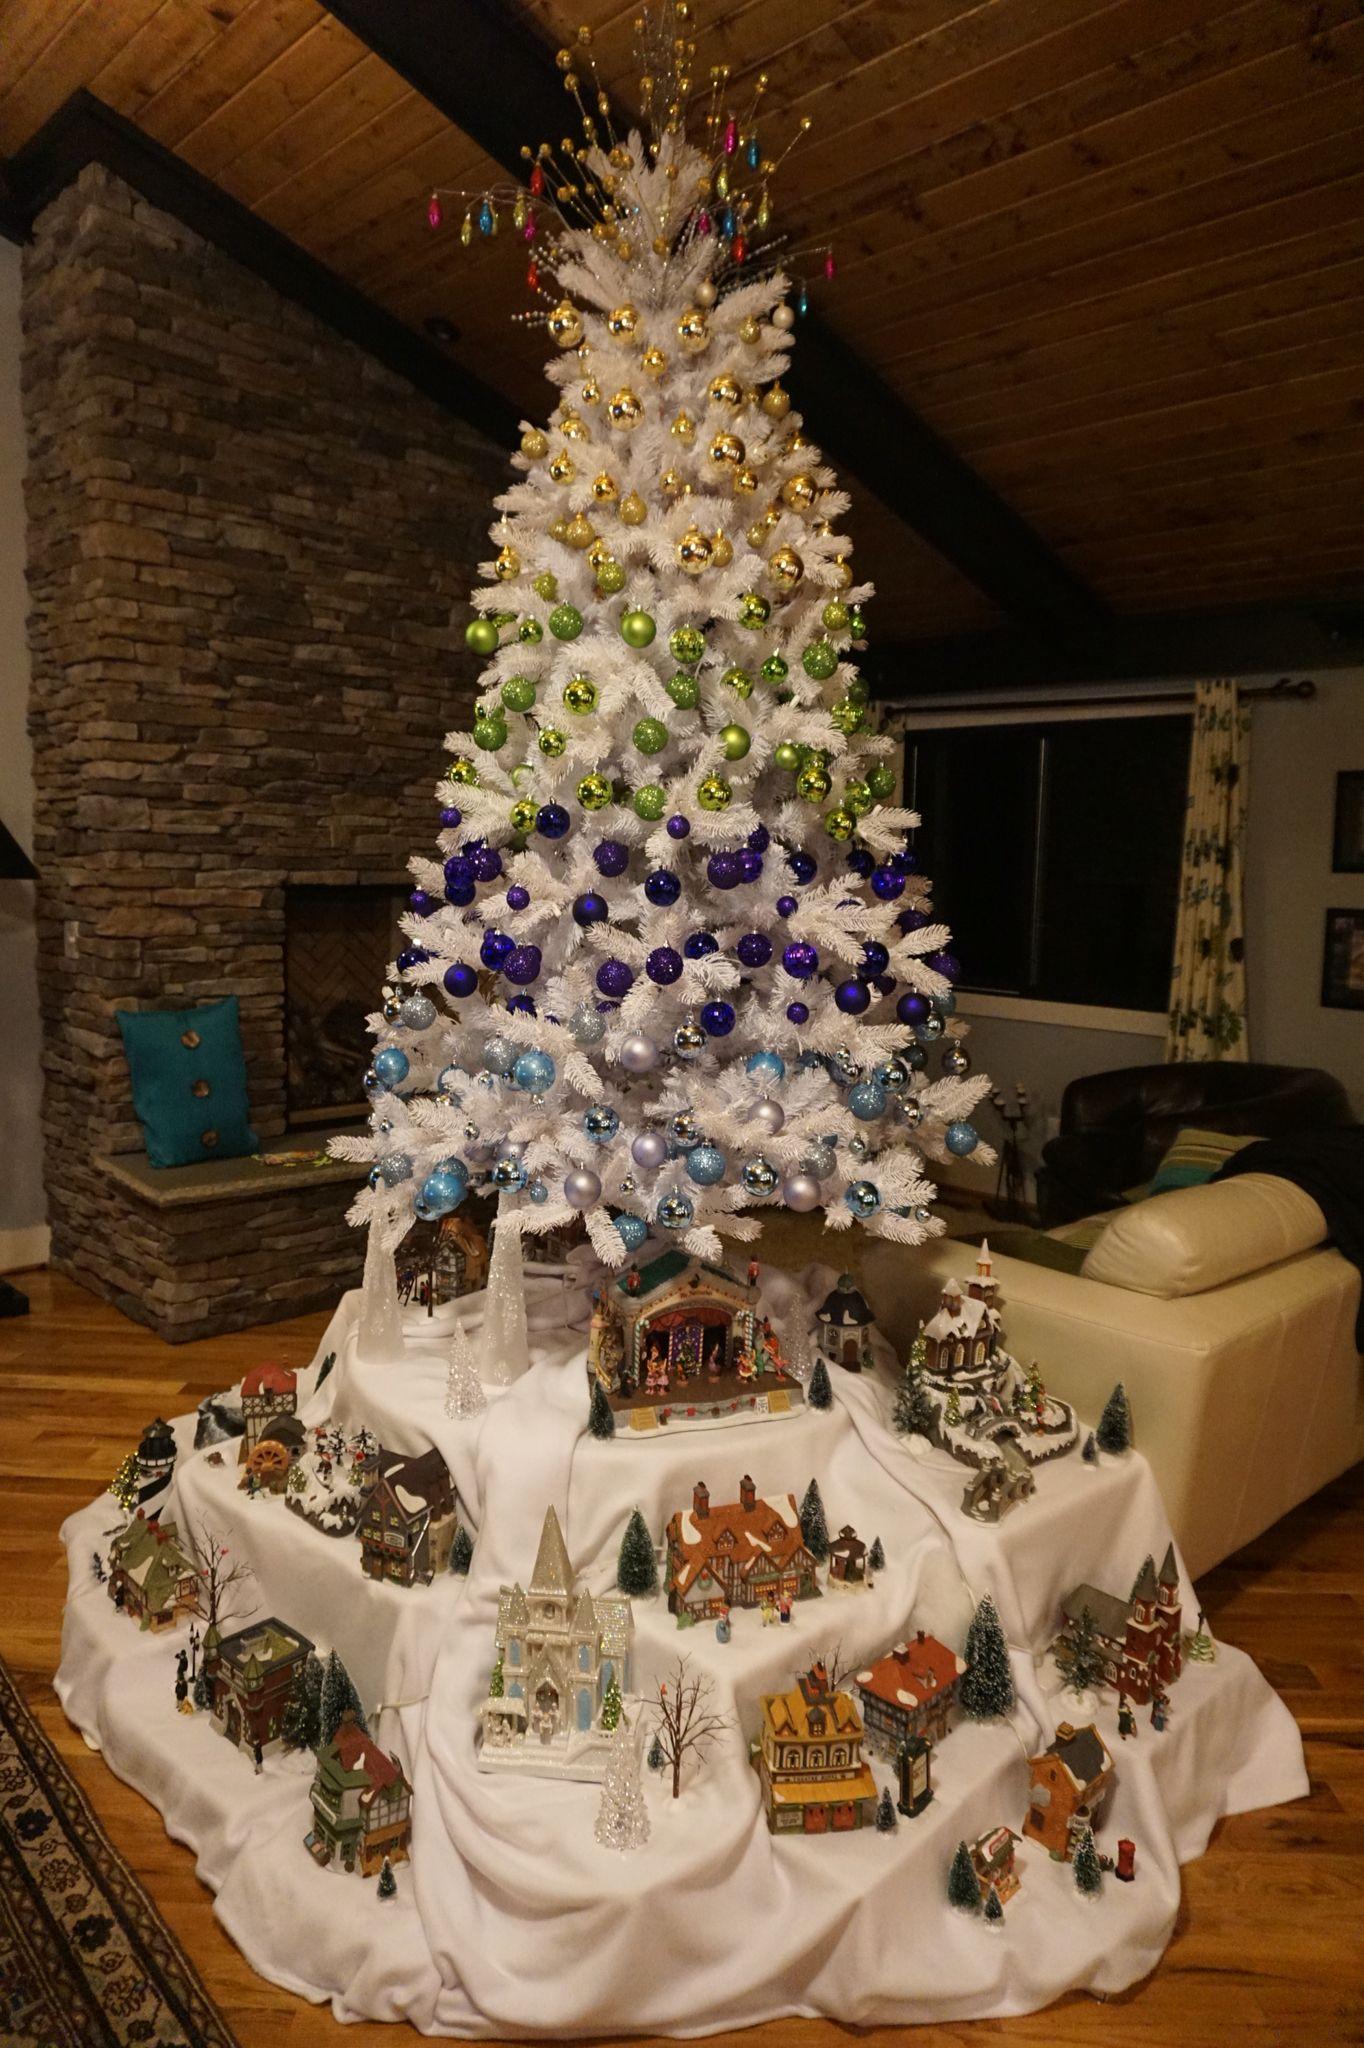 Christmas Village Under The Tree